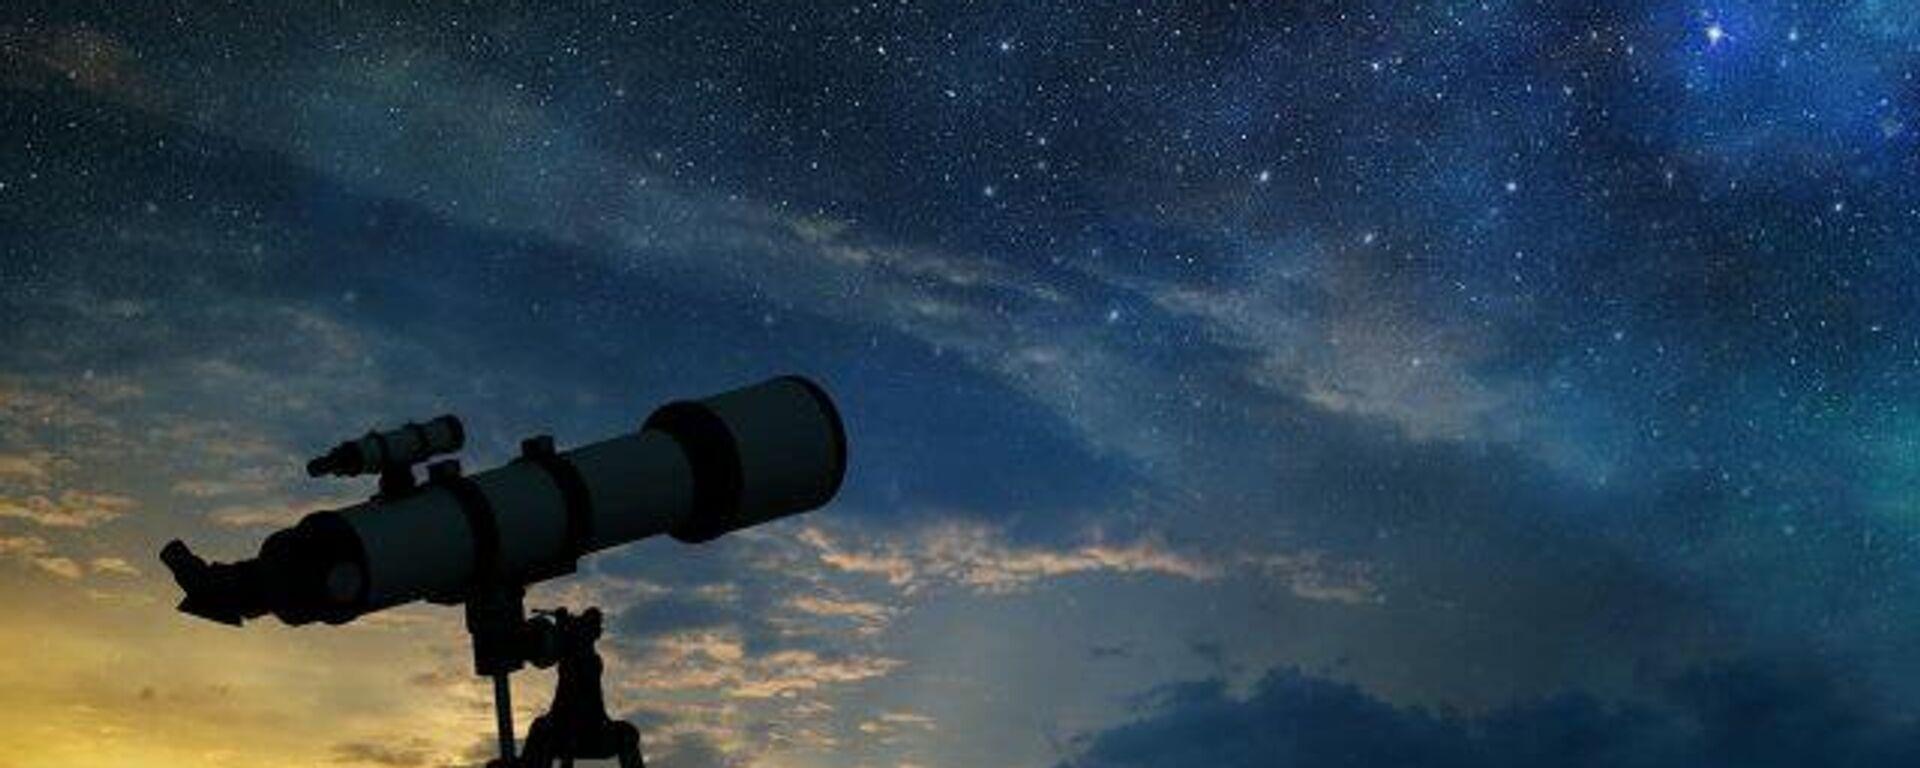 TELESCOPIO 6 de setiembre  - Sputnik Mundo, 1920, 06.09.2021